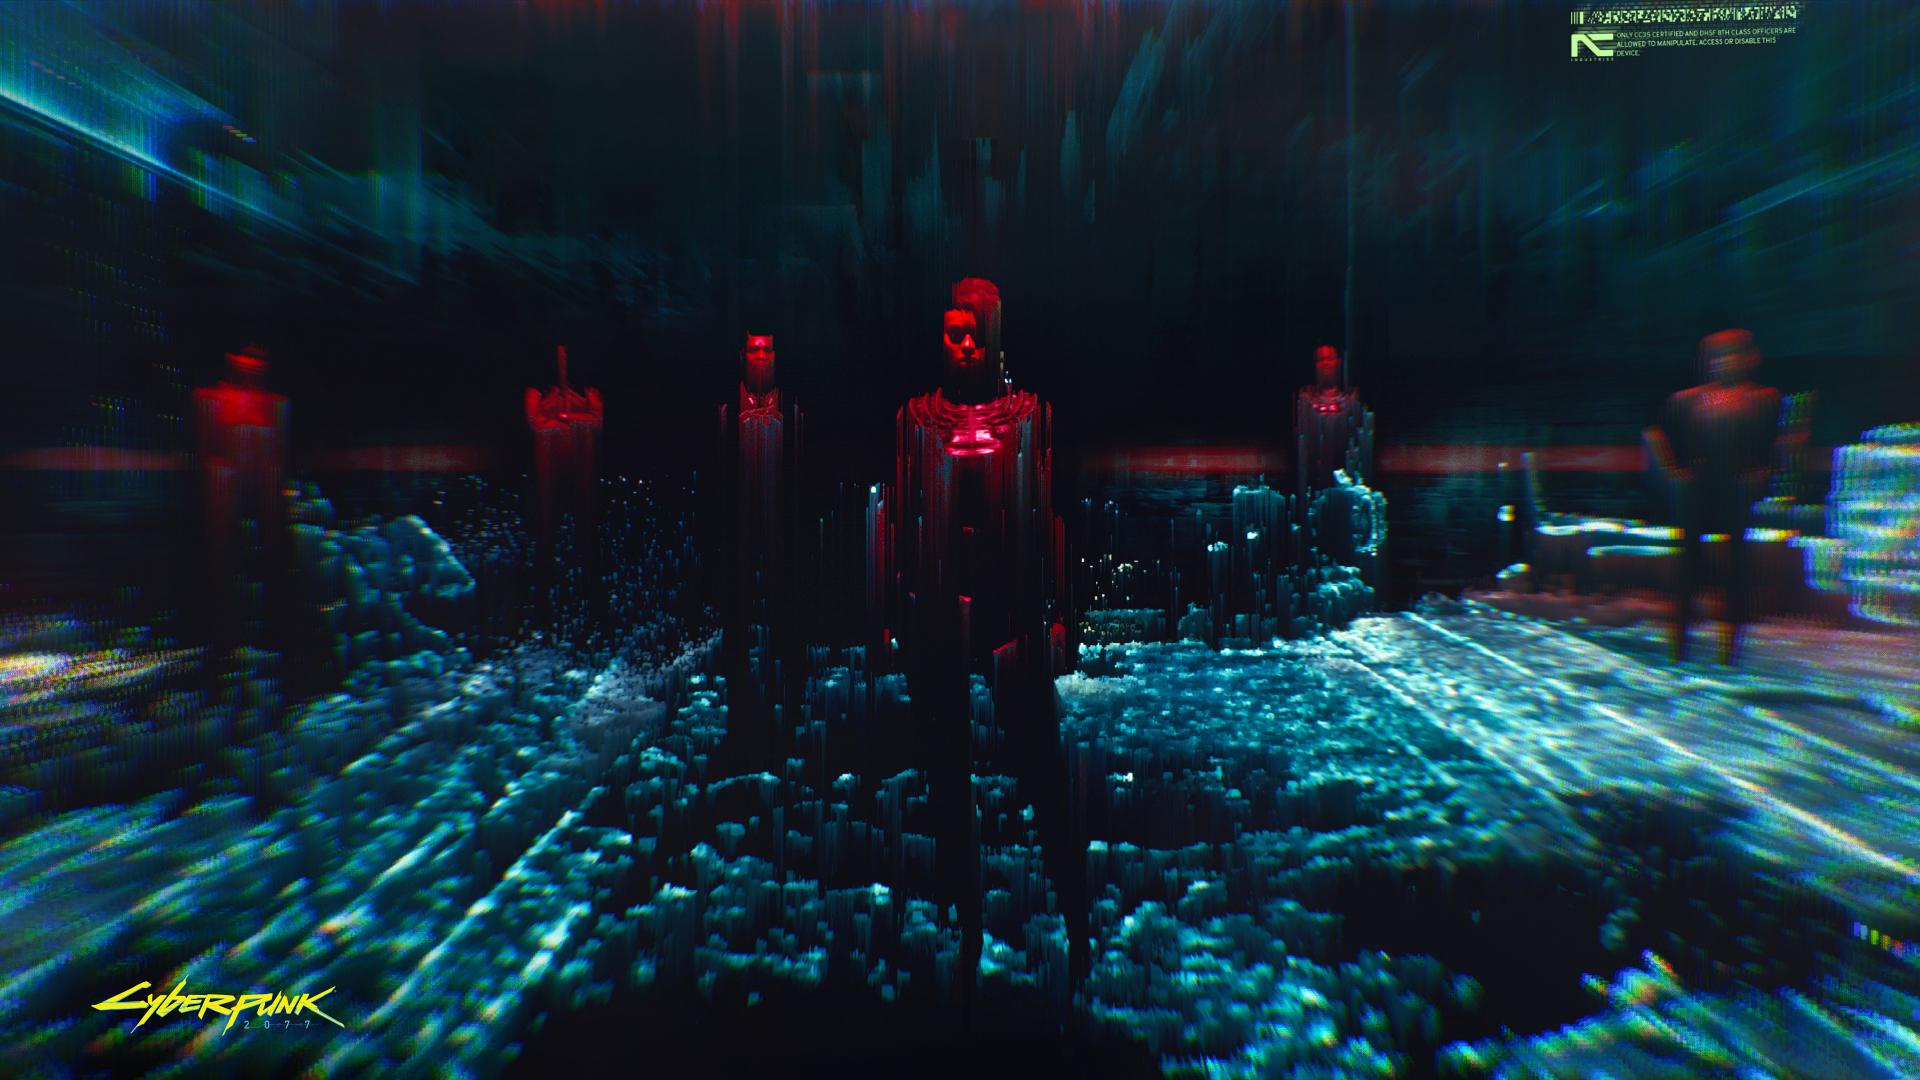 1920x1080 cyberpunk 2077 4k 1080p laptop full hd wallpaper hd games 4k wallpapers images - Cyberpunk 2077 wallpaper 4k ...